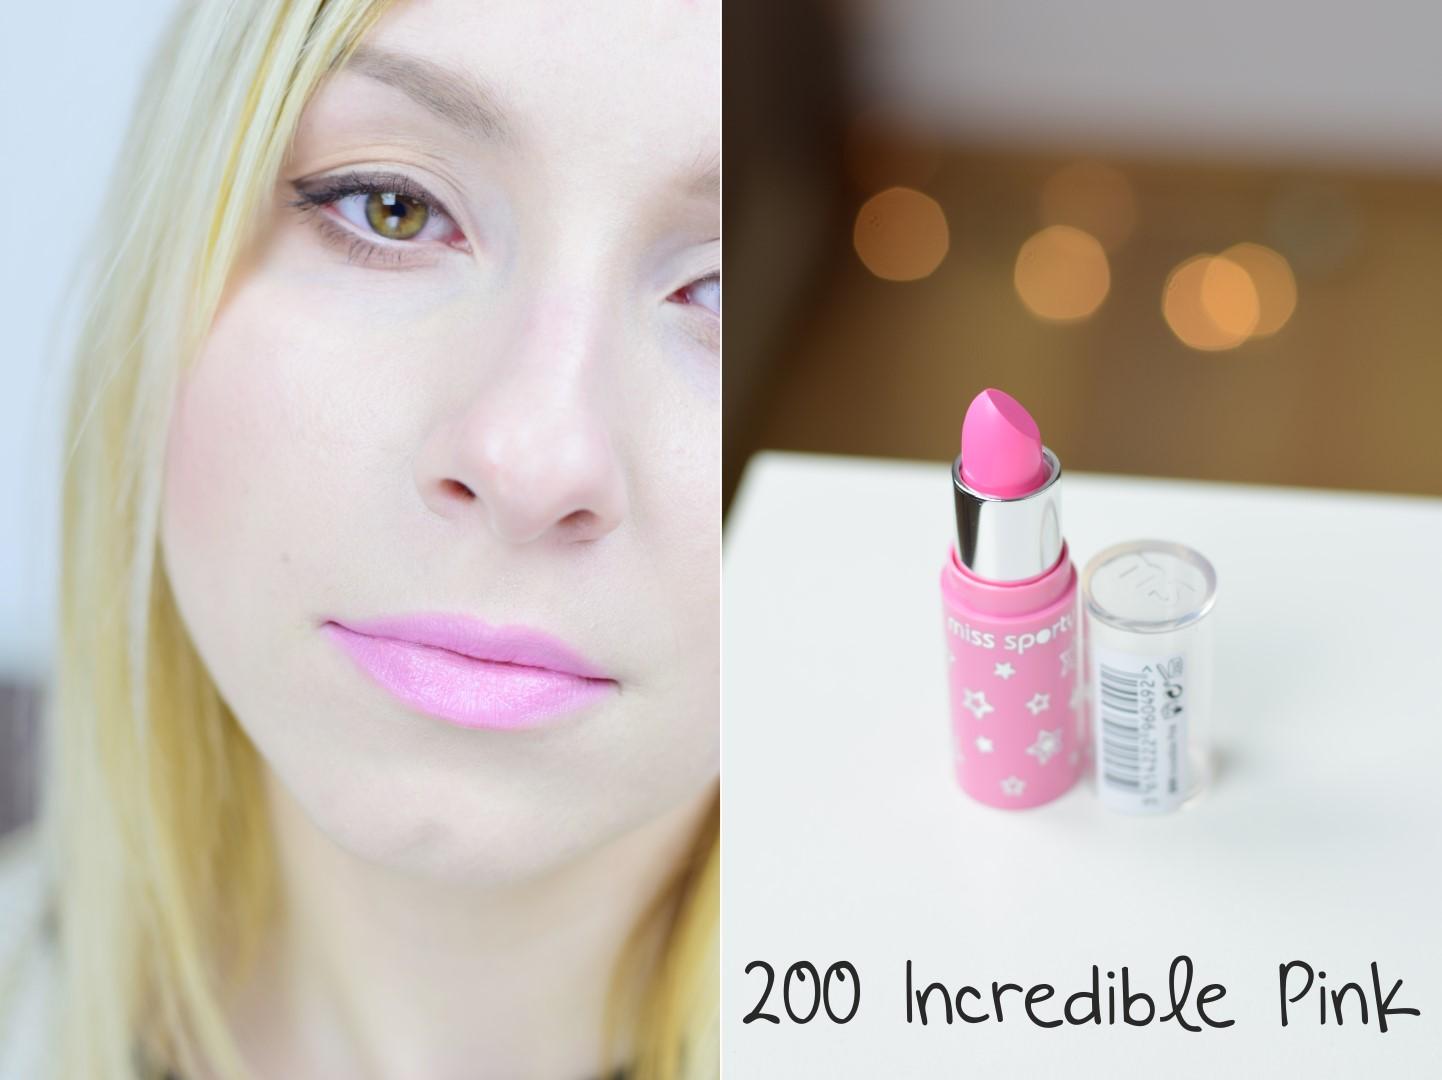 miss_sporty_wonder_smooth_blog_opinia_recenzja_swatche_incredible_pink_200